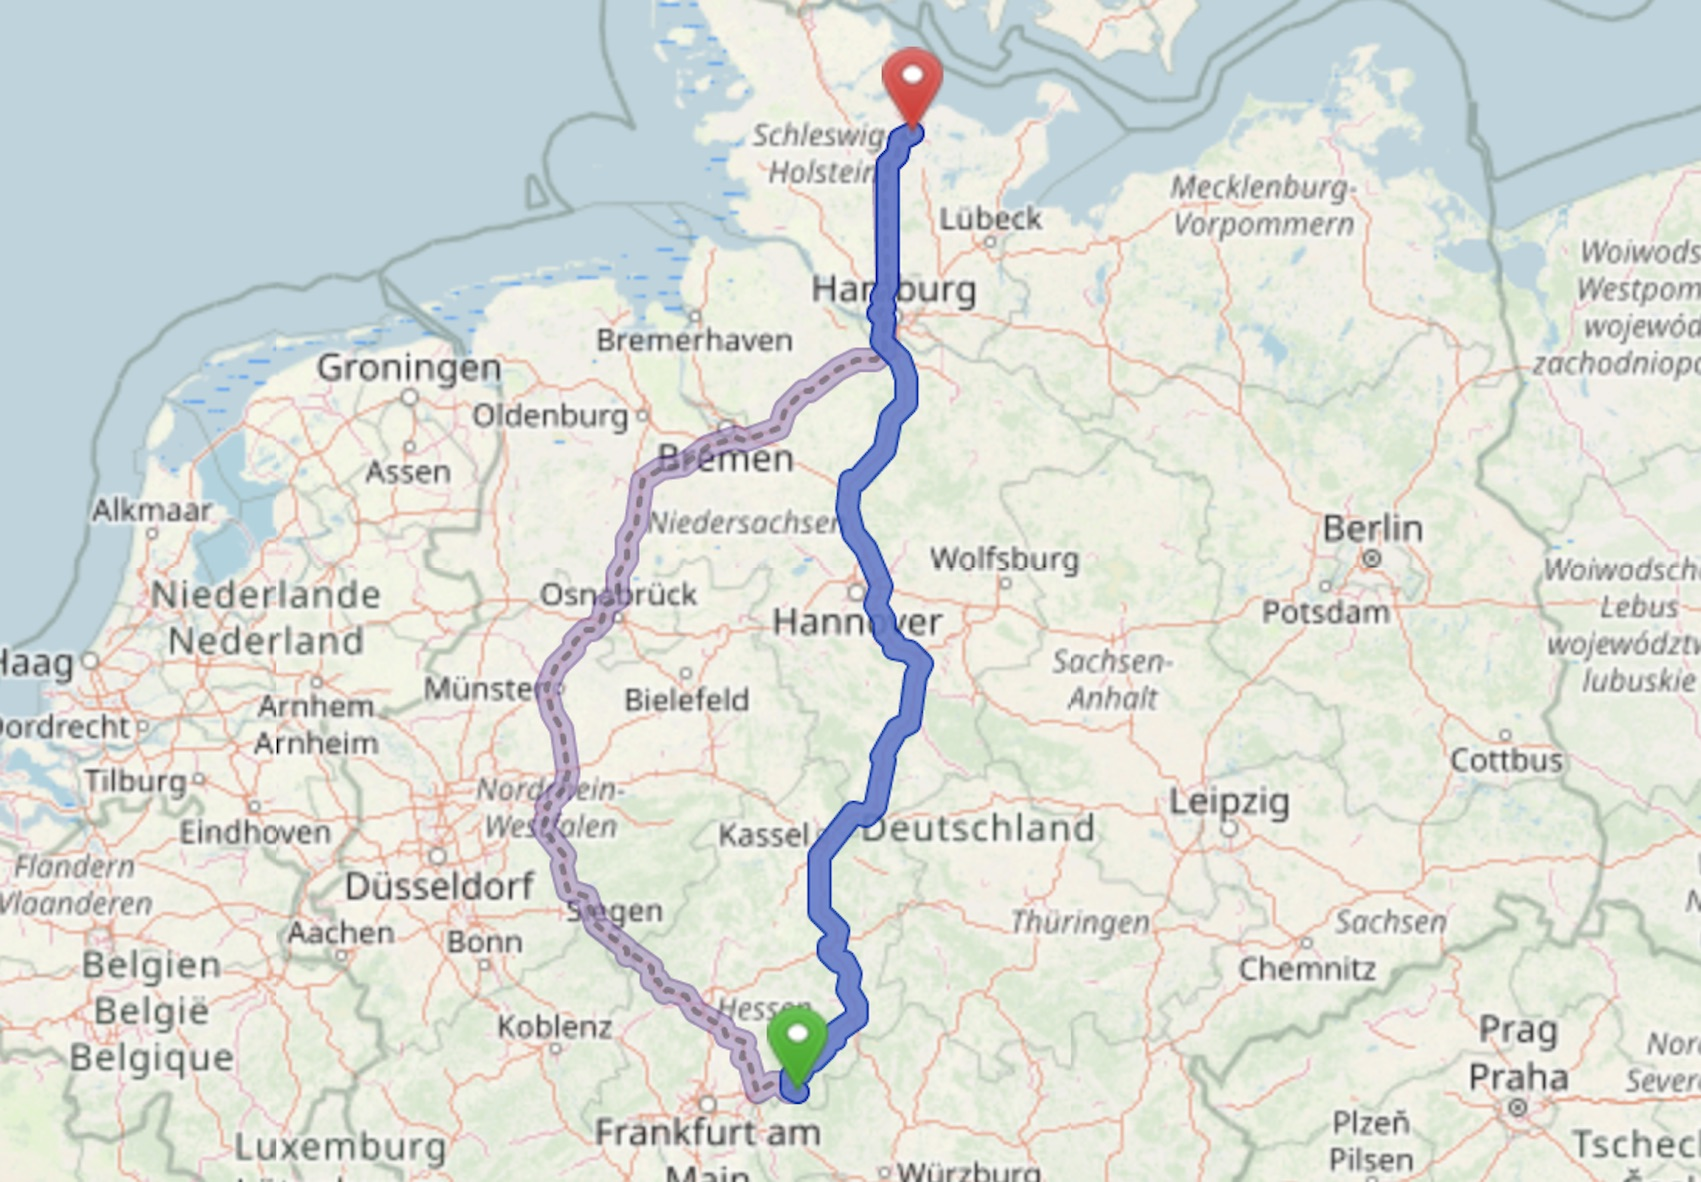 Reise in den Norden (Foto: Open Street Map)